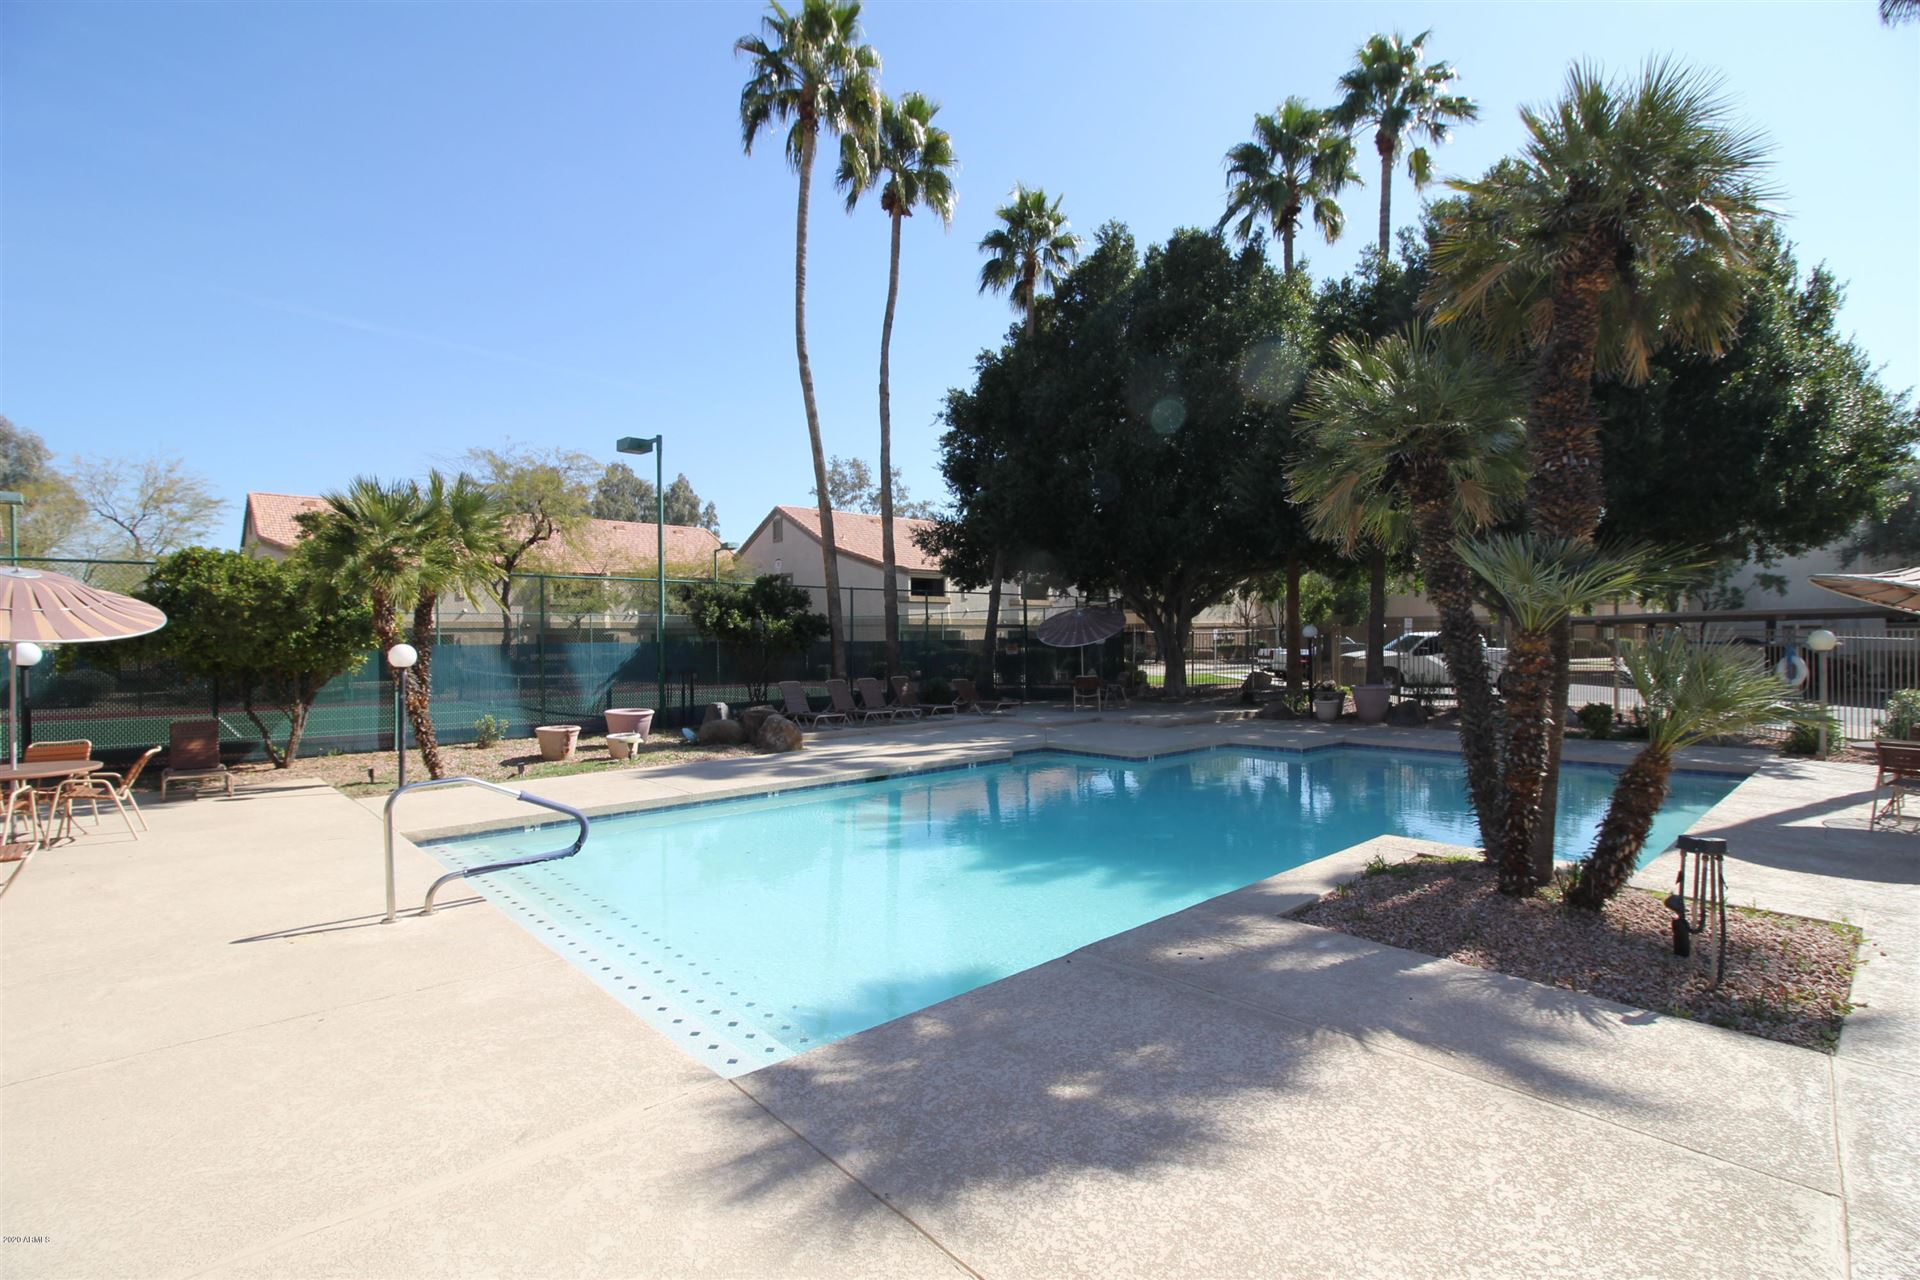 1287 N ALMA SCHOOL Road #123, Chandler, AZ 85224 - MLS#: 6133940